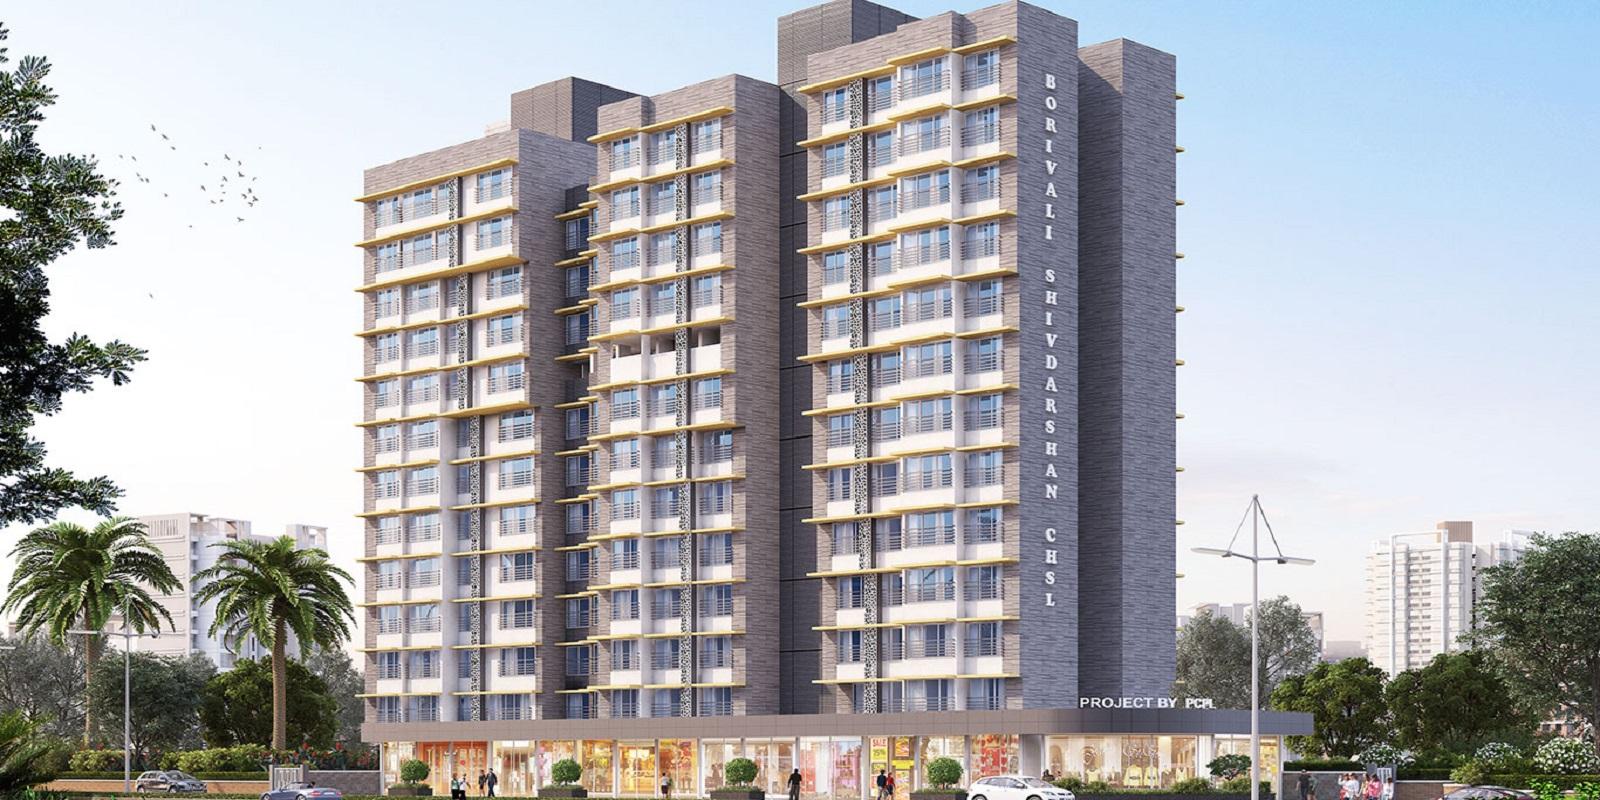 pranav borivali shivdarshan chsl project project large image1